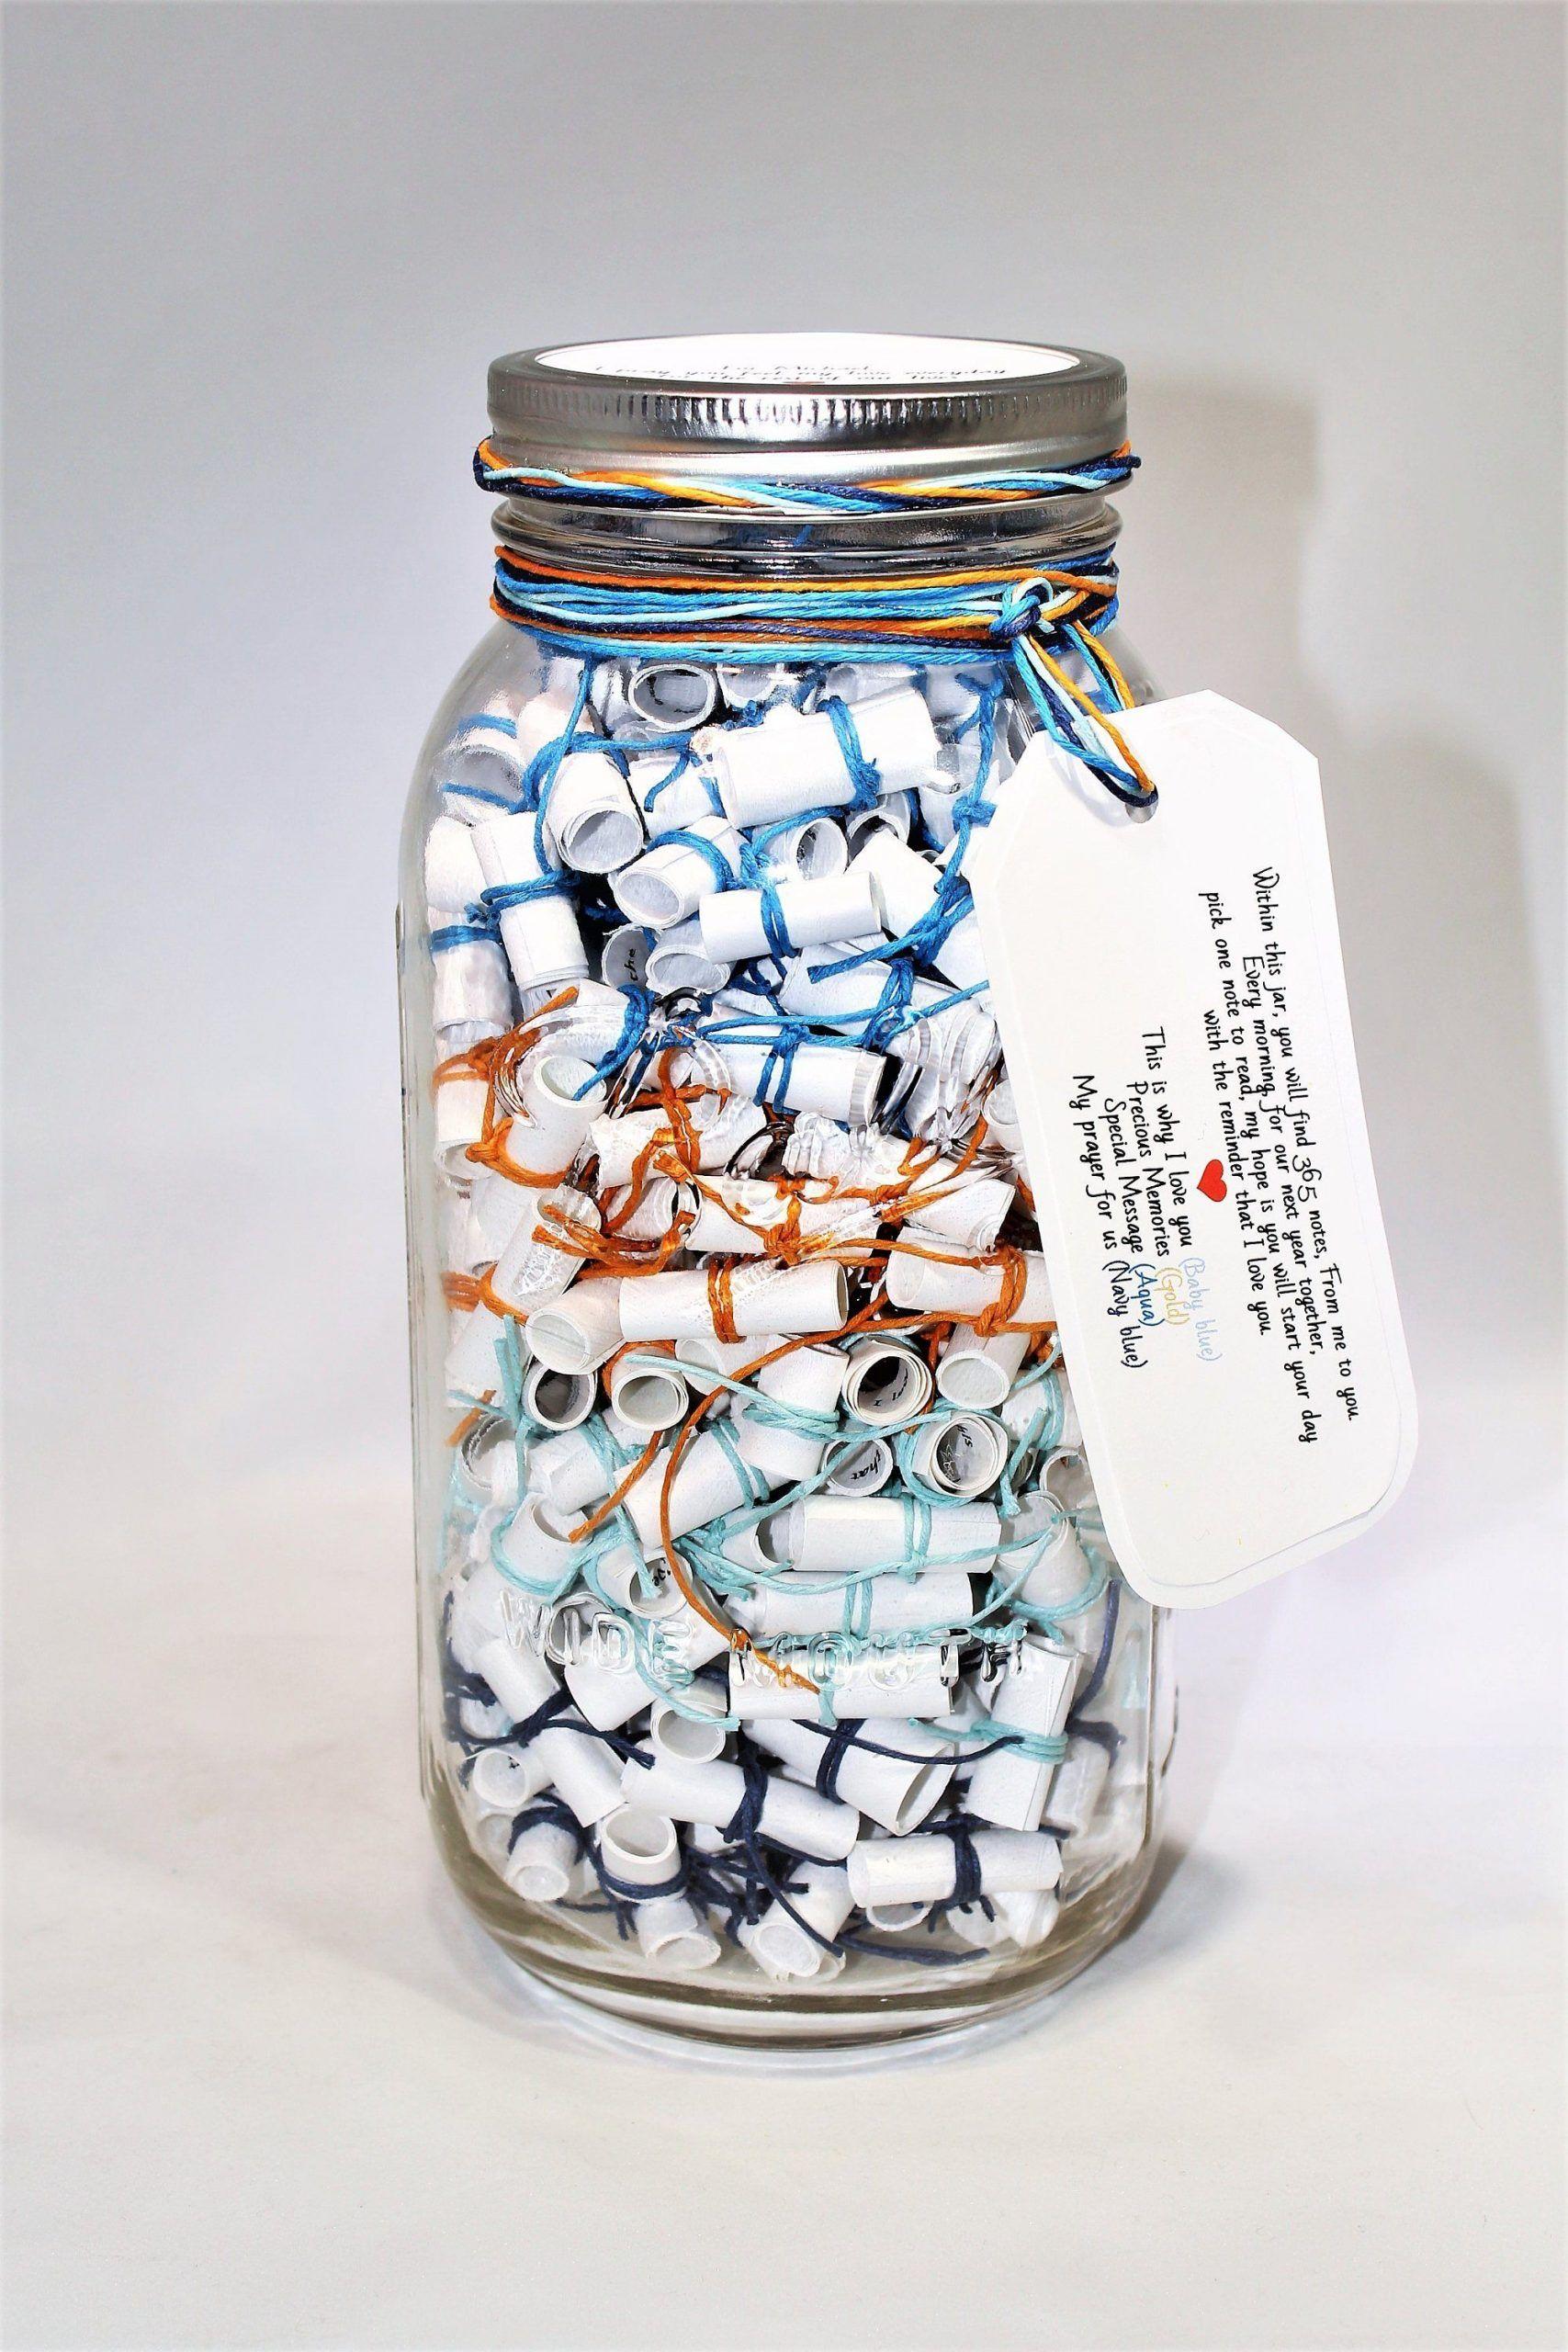 365 Message Filled 64 Oz Mason Jar Personalized Multi Colored Fun Wish Jar Filled Fun Jar Mason Message Multicolored Pe In 2020 Mason Jars Jar Diy Gifts